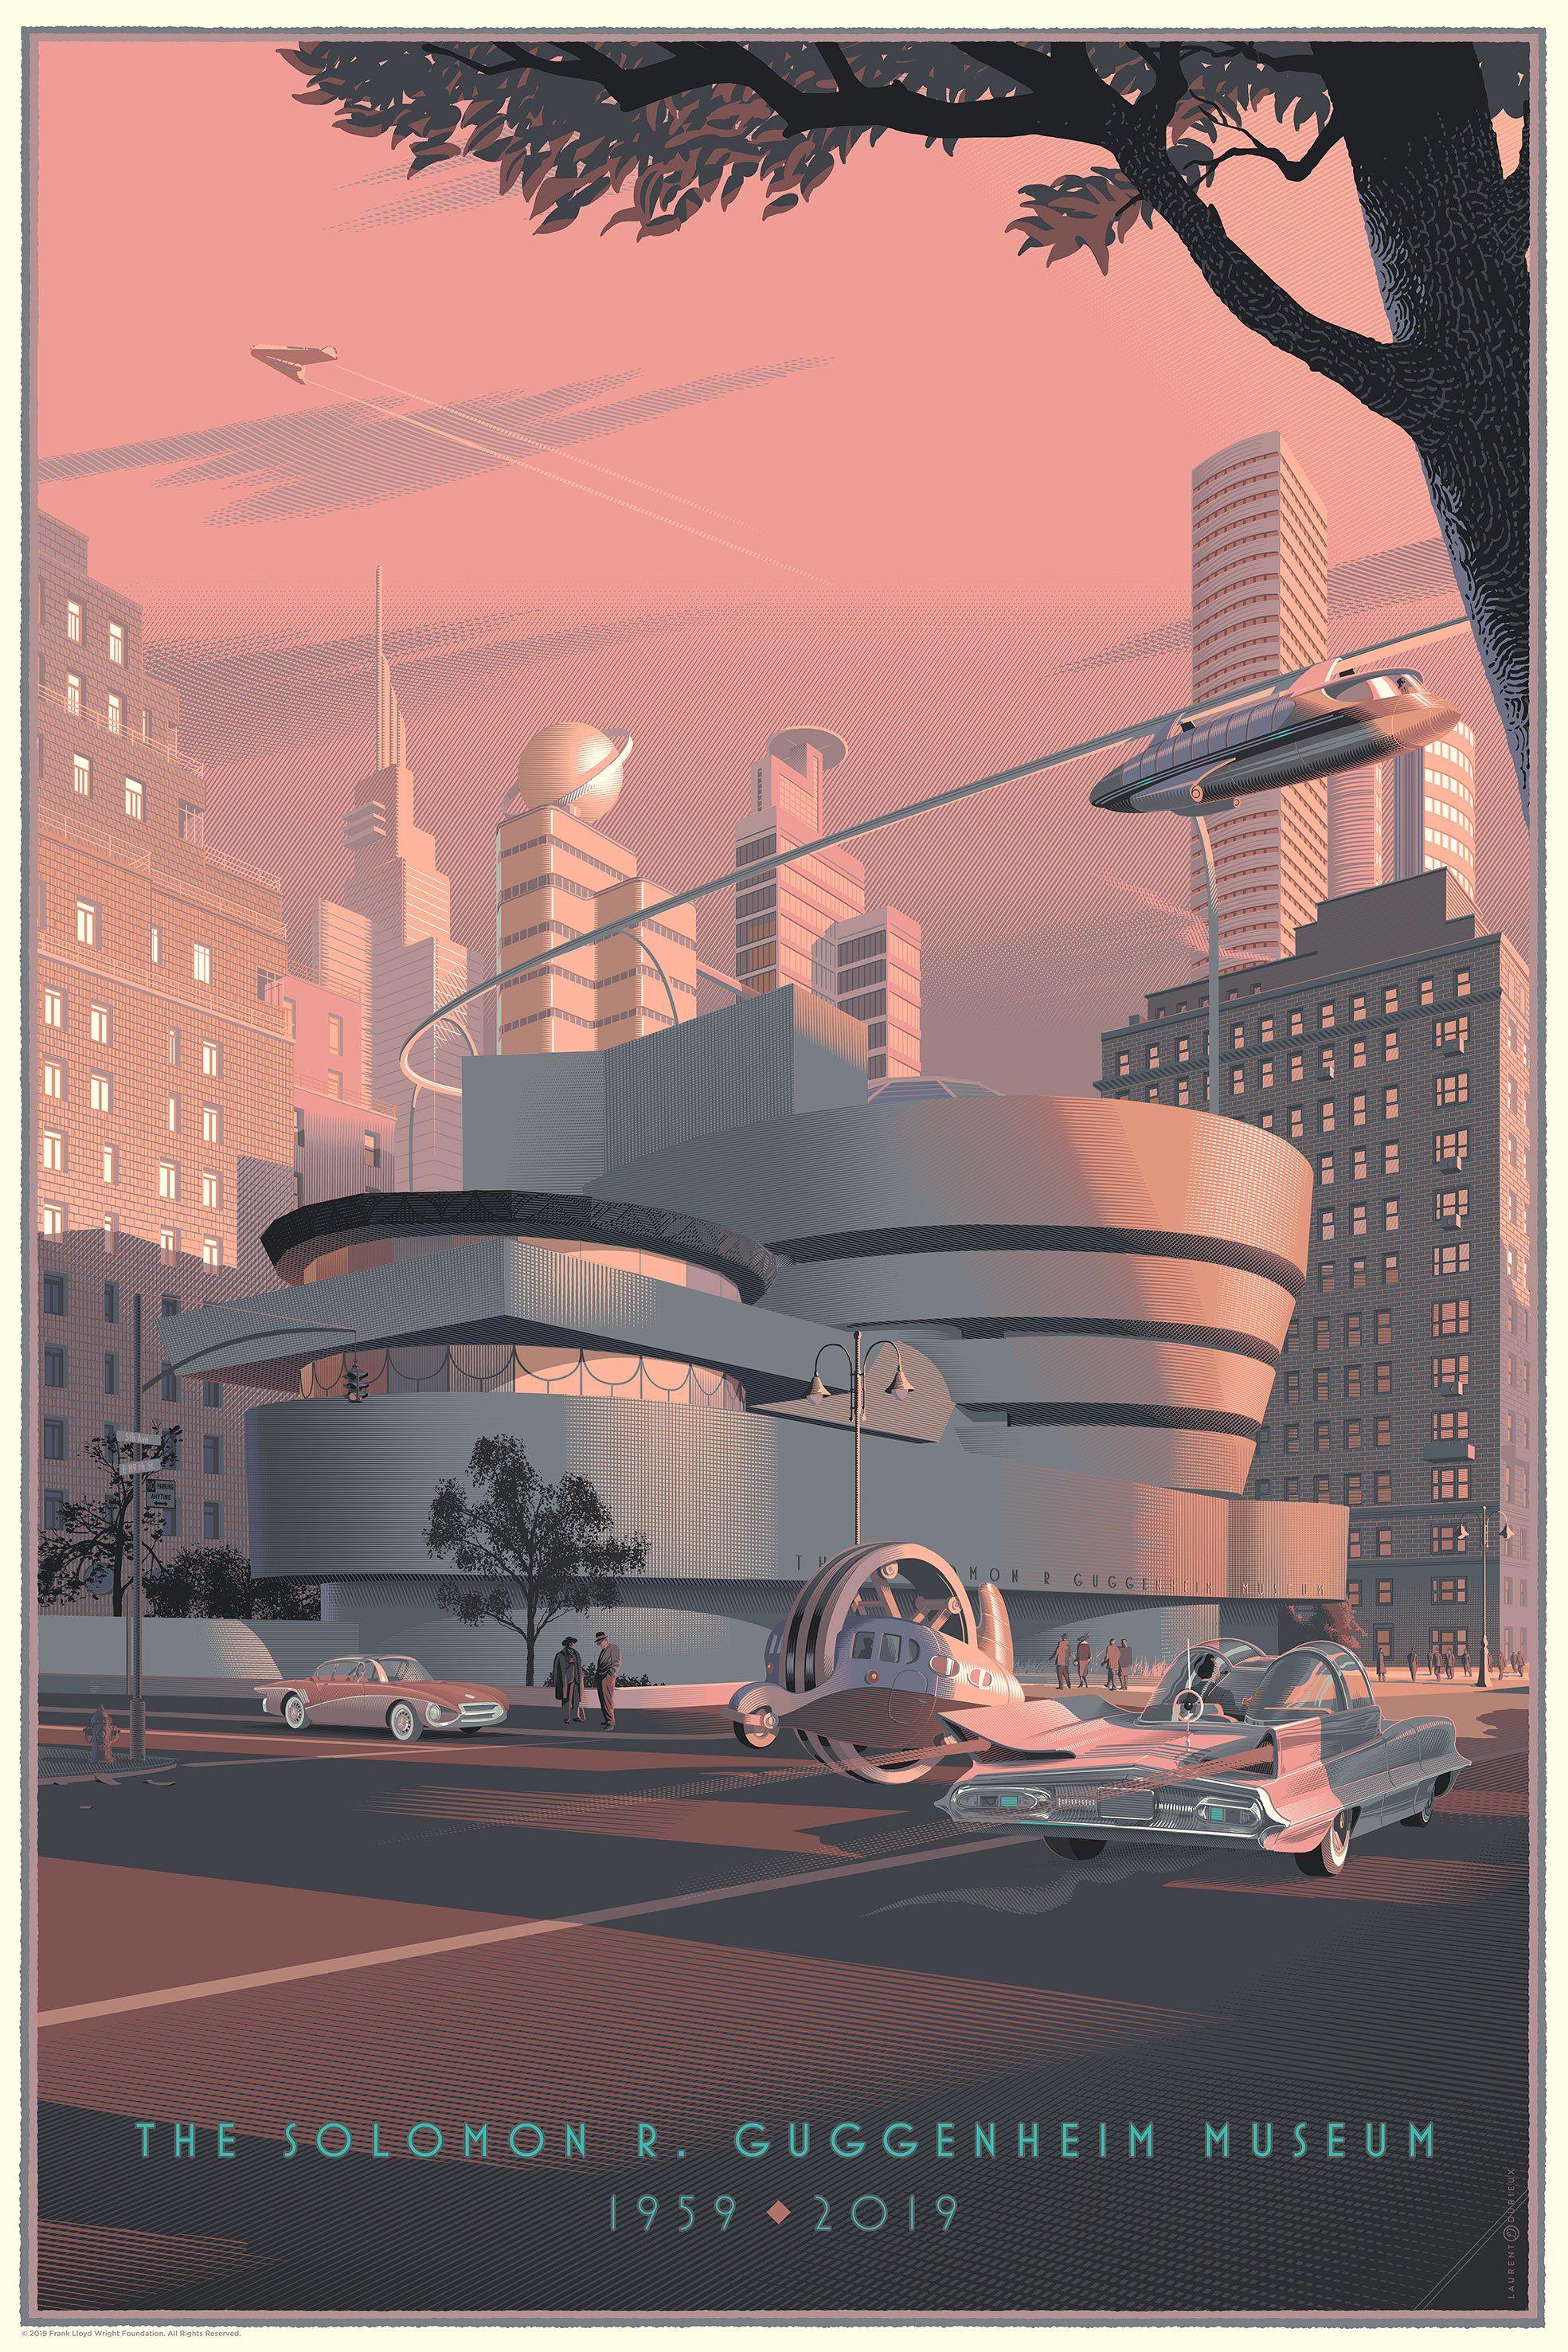 Laurent Durieux Spoke Art Limited Edition Screen Prints Guggenheim